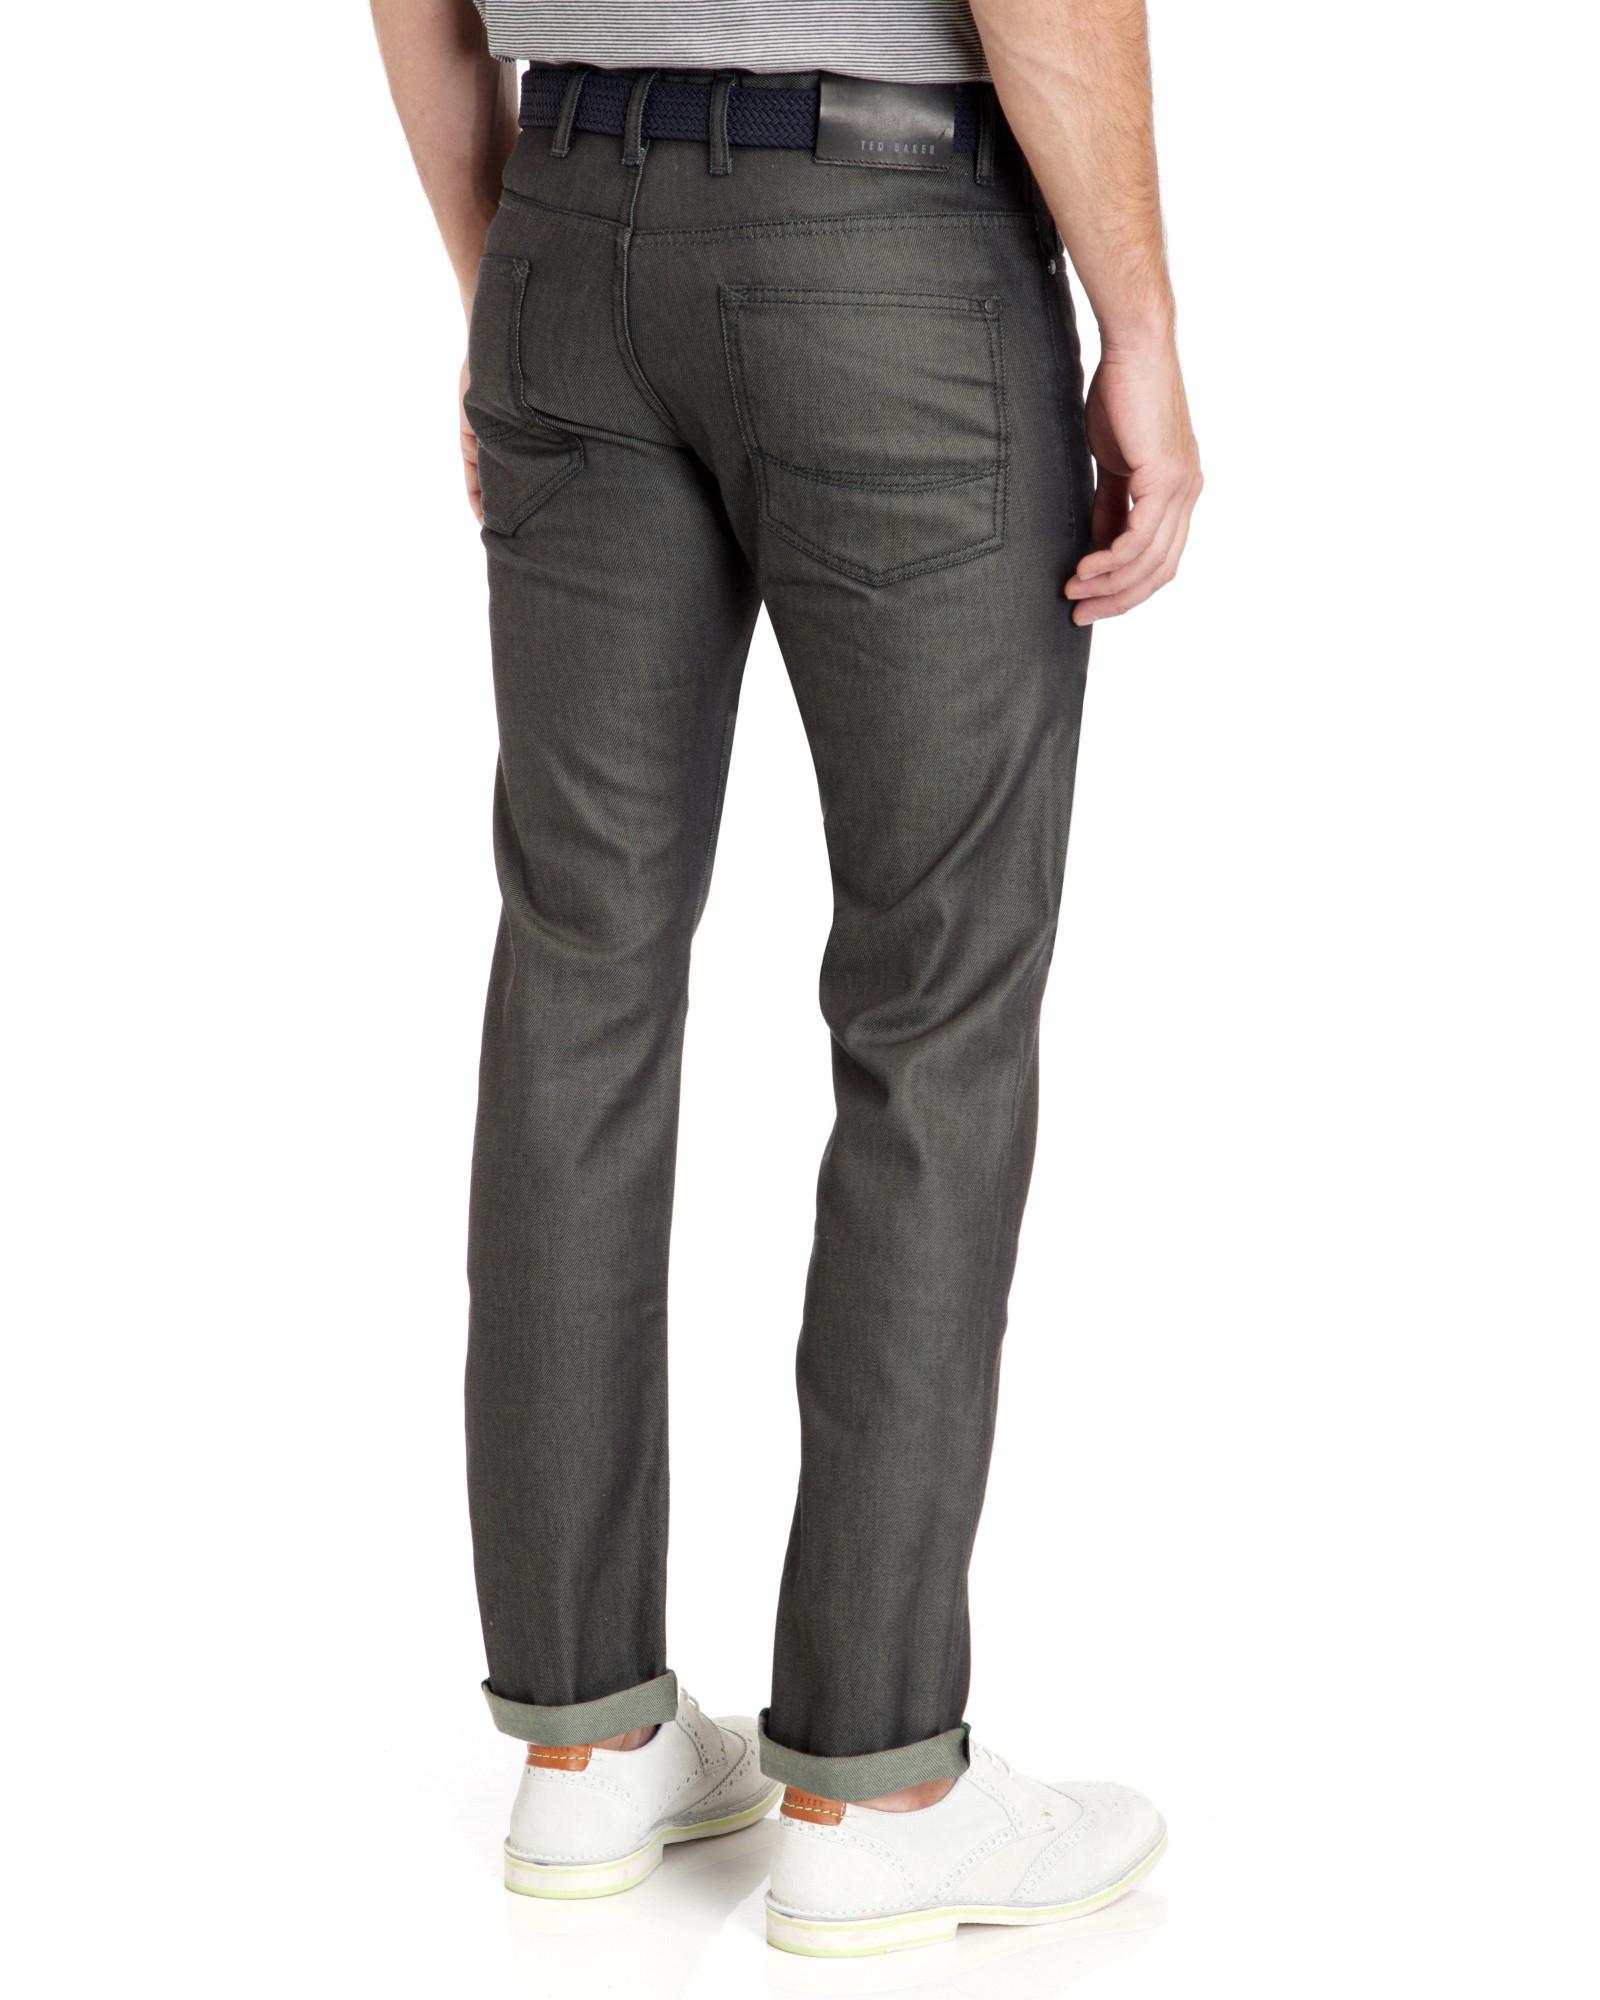 Ted Baker Scarva Slim Fit Grey Rinse Jean in Denim Rinse (Blue) for Men